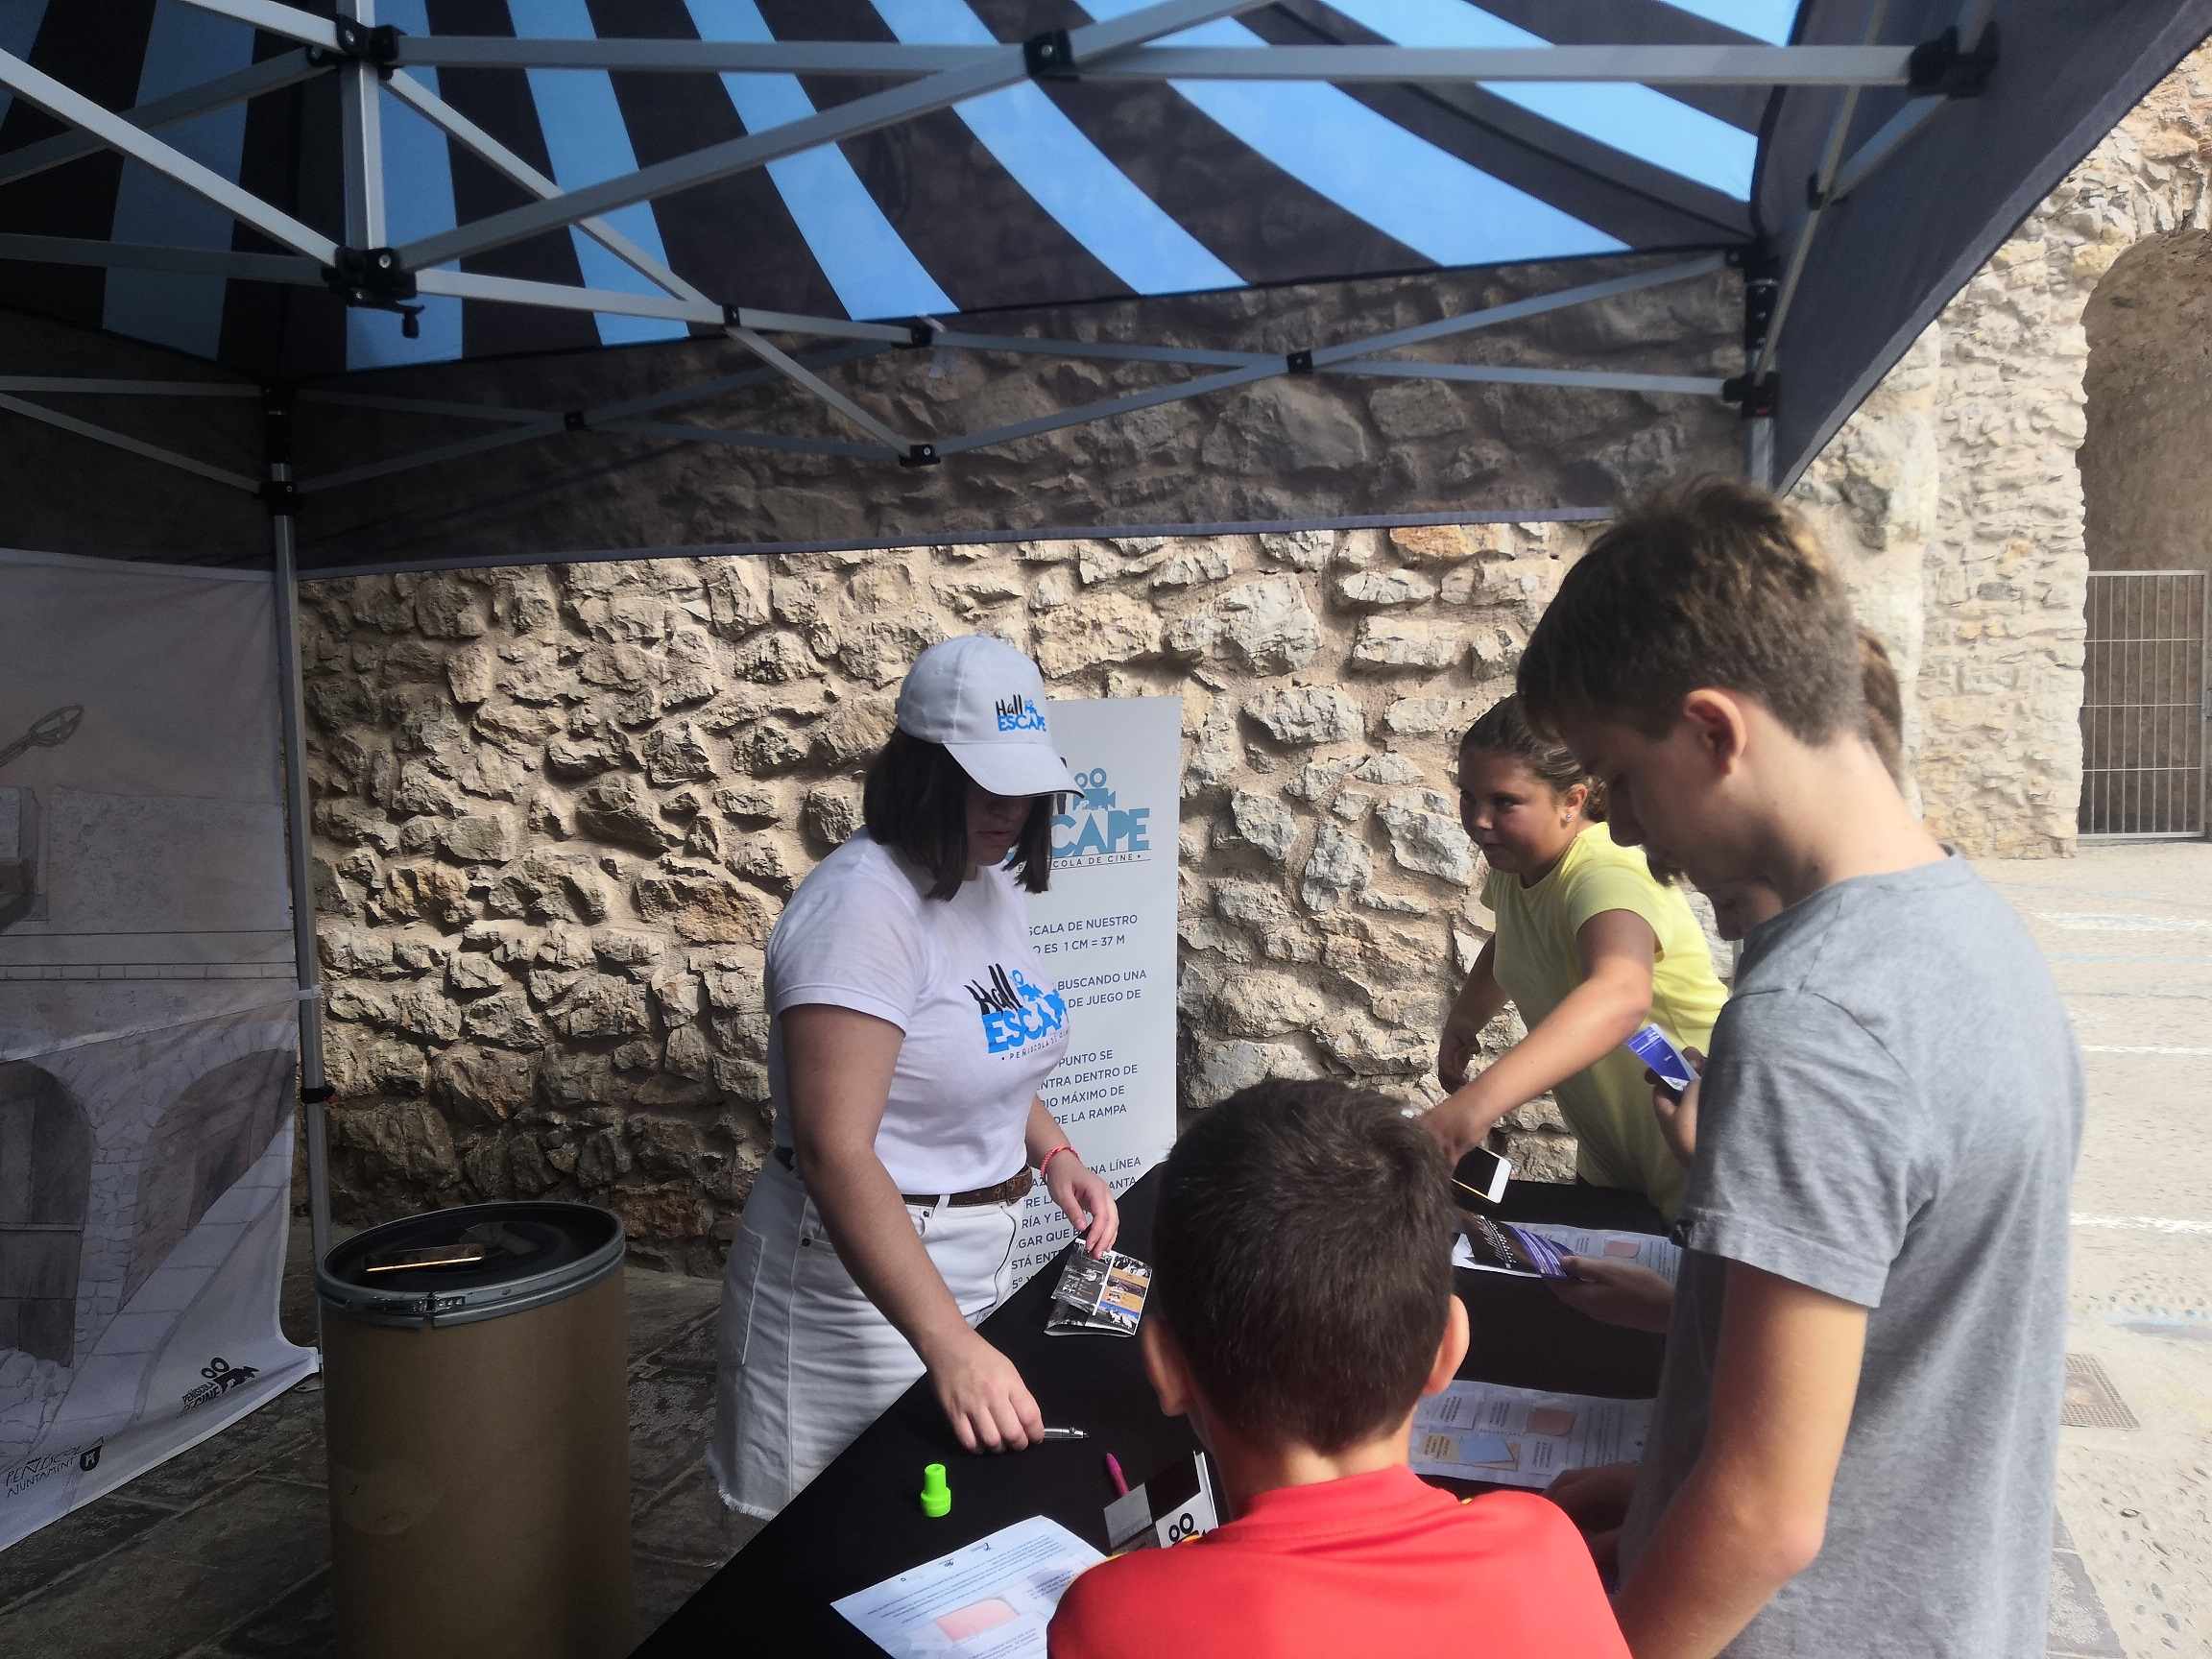 Peníscola, més de 500 persones participen en el Halle Escape